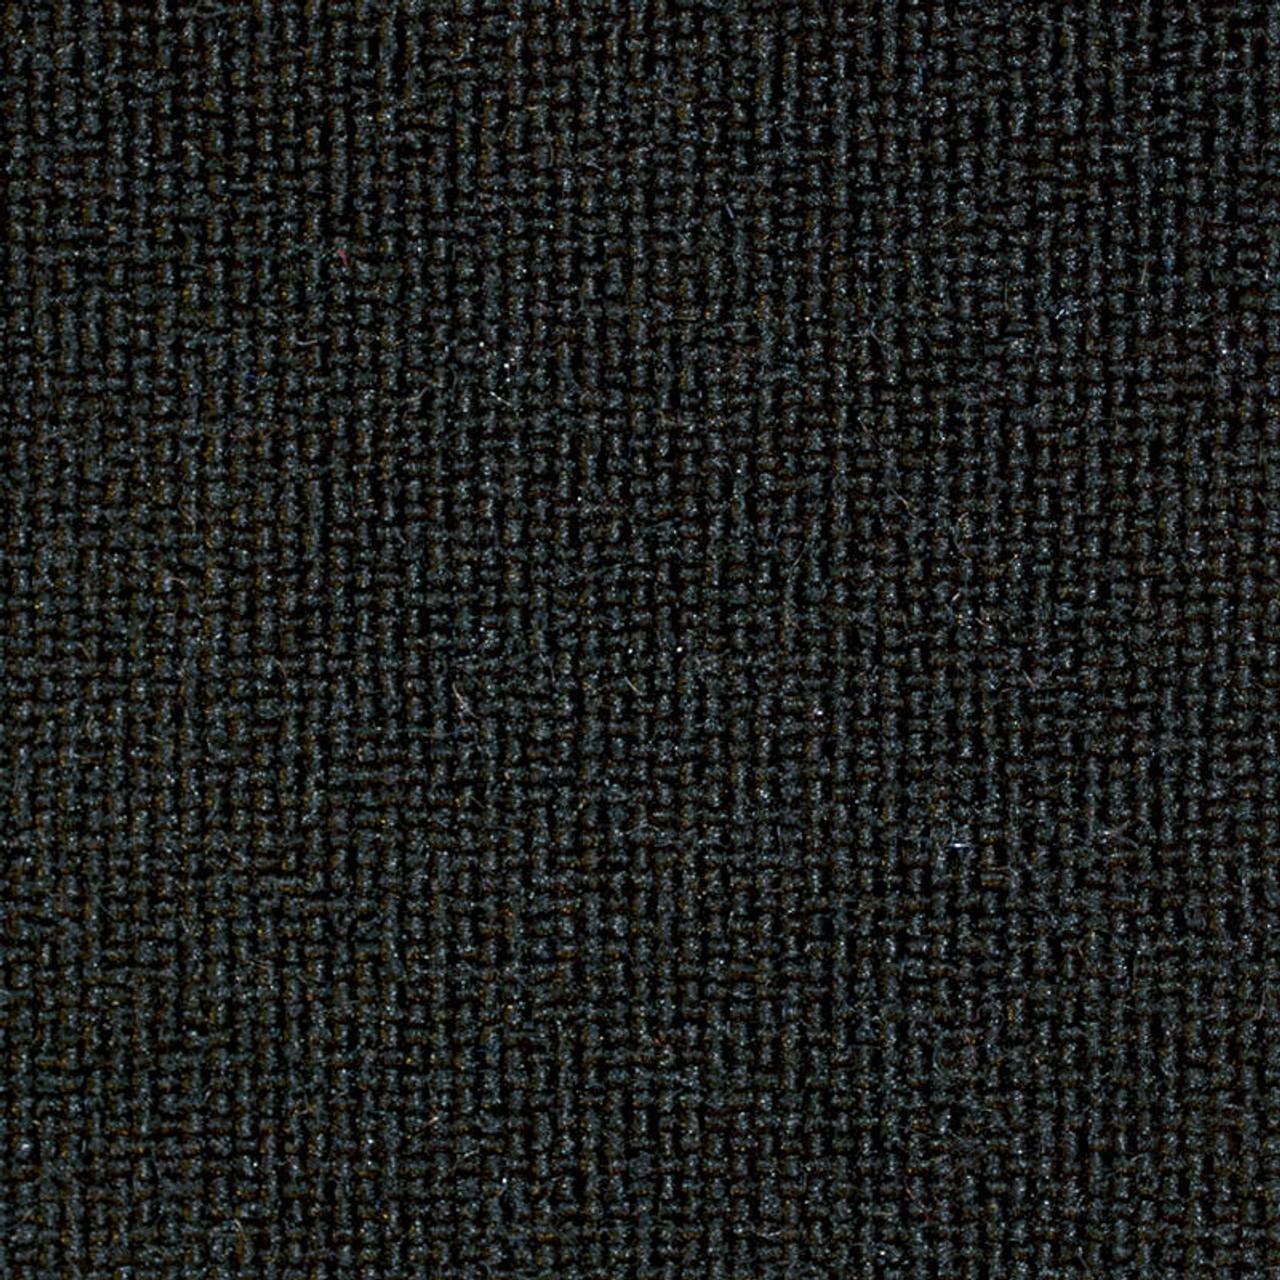 Ebony or Black in Color